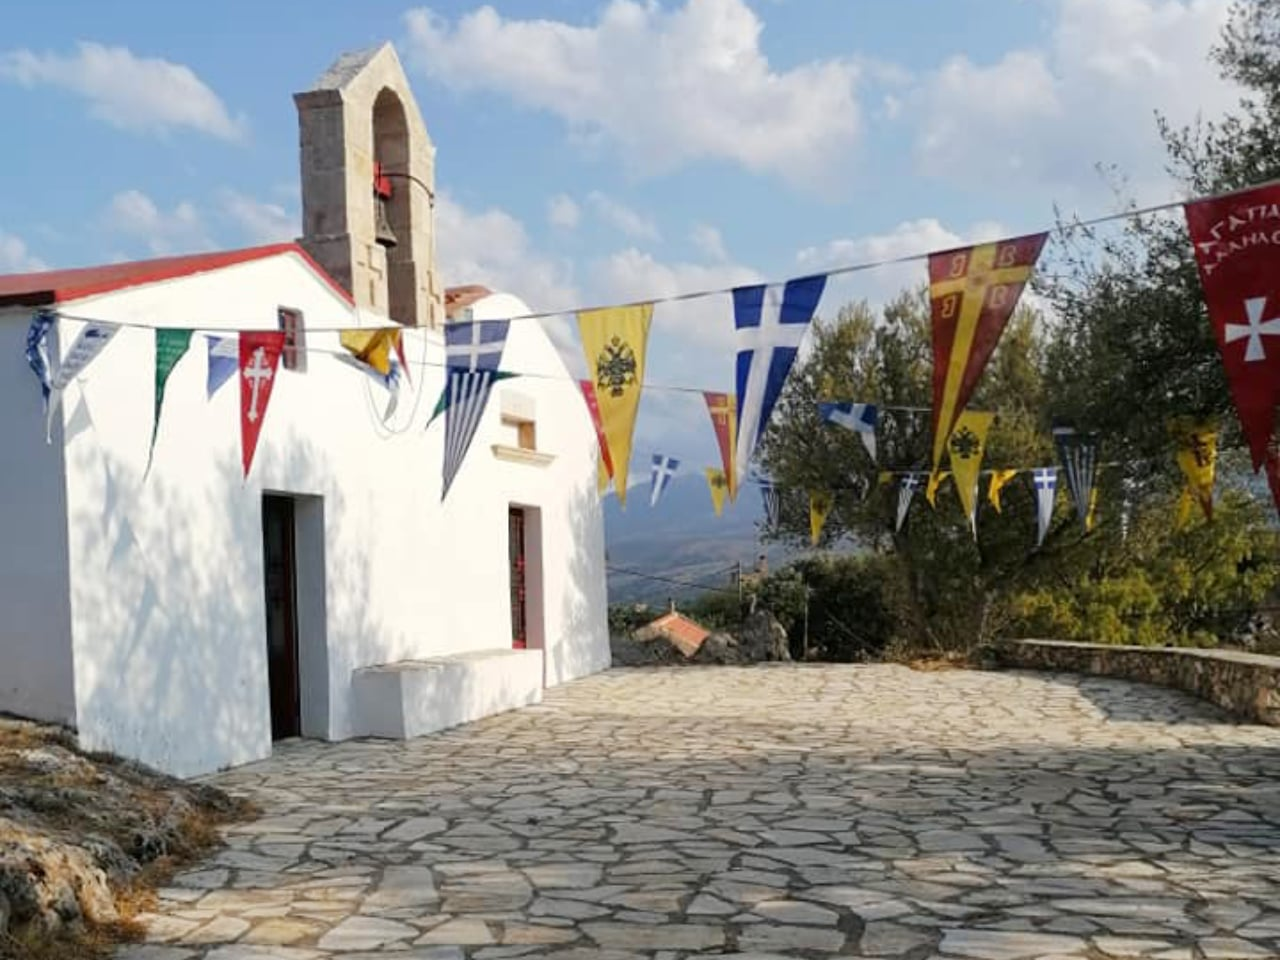 samonas traditional village, samonas village apokoronas chania crete, samonas village hotel, samonas chania crete activities, things to do samonas